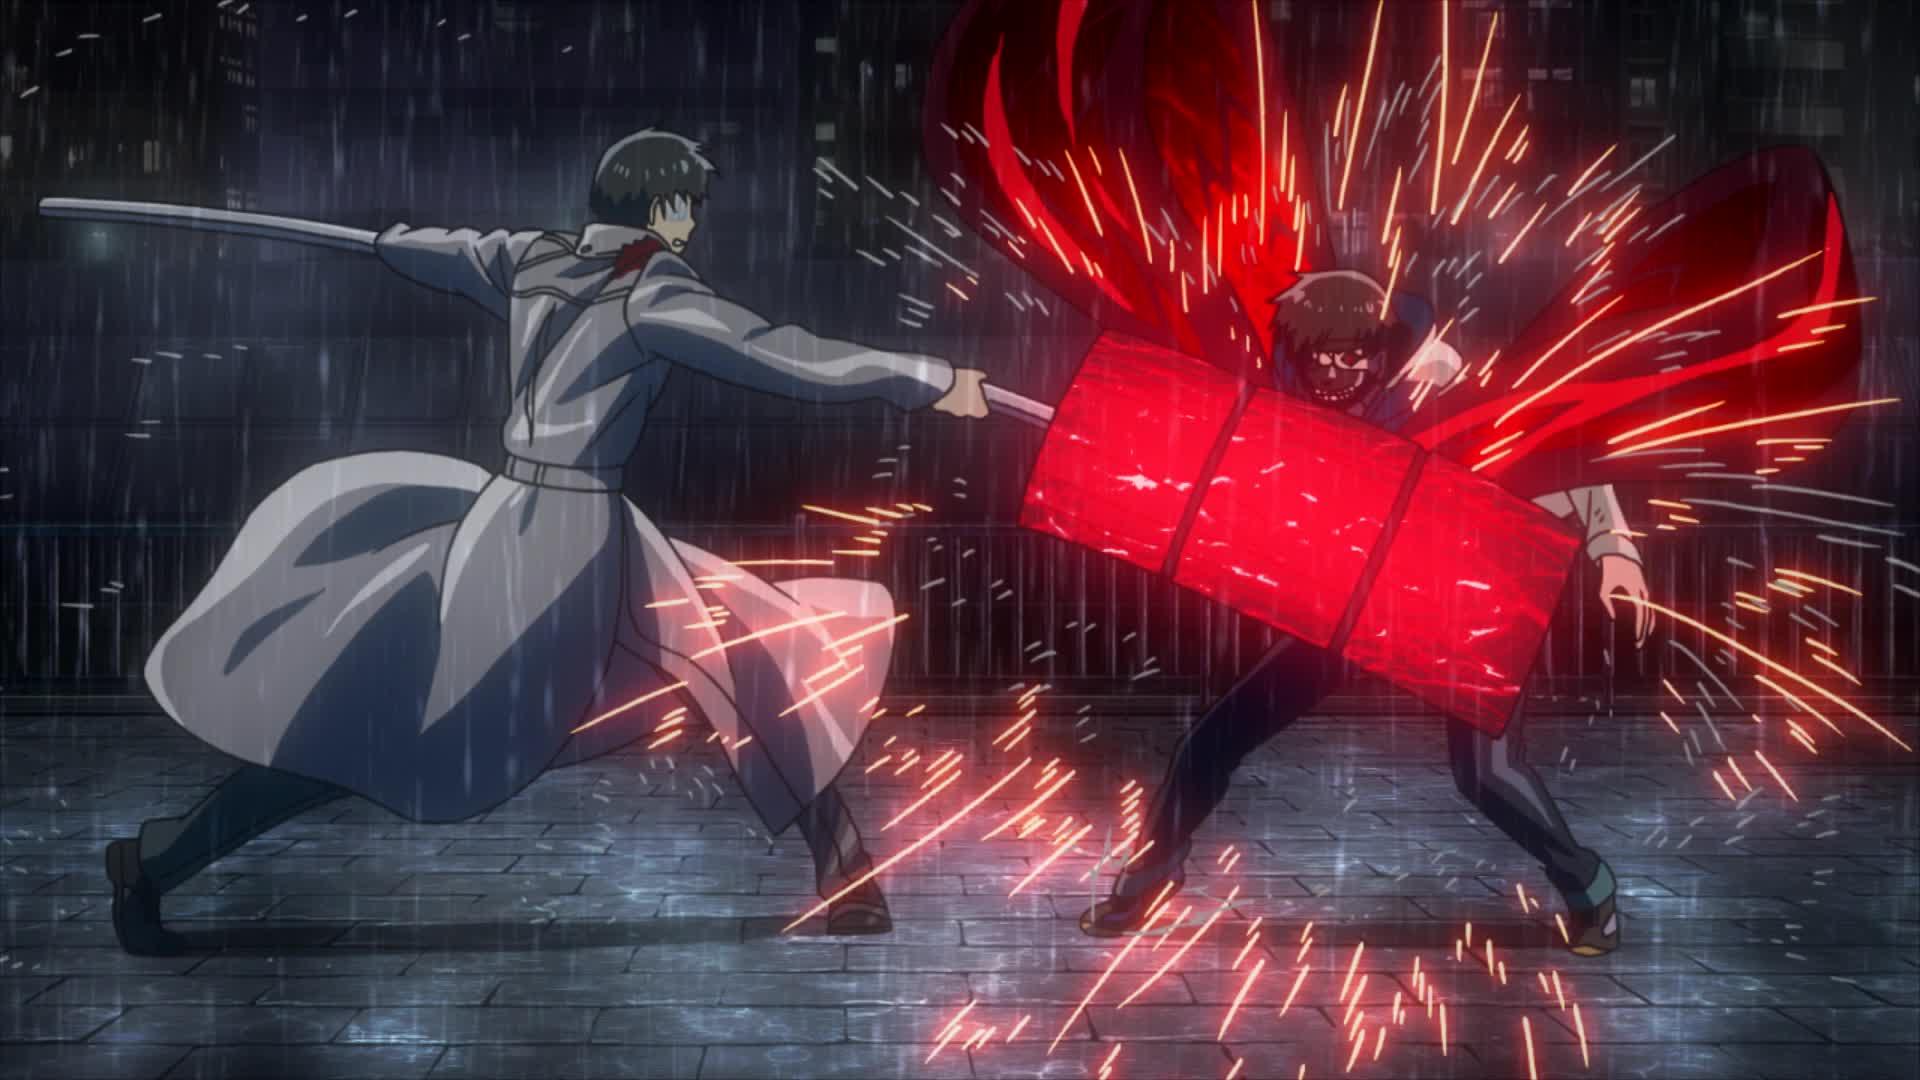 Tokyo ghoul season 1 episode 14 english dub